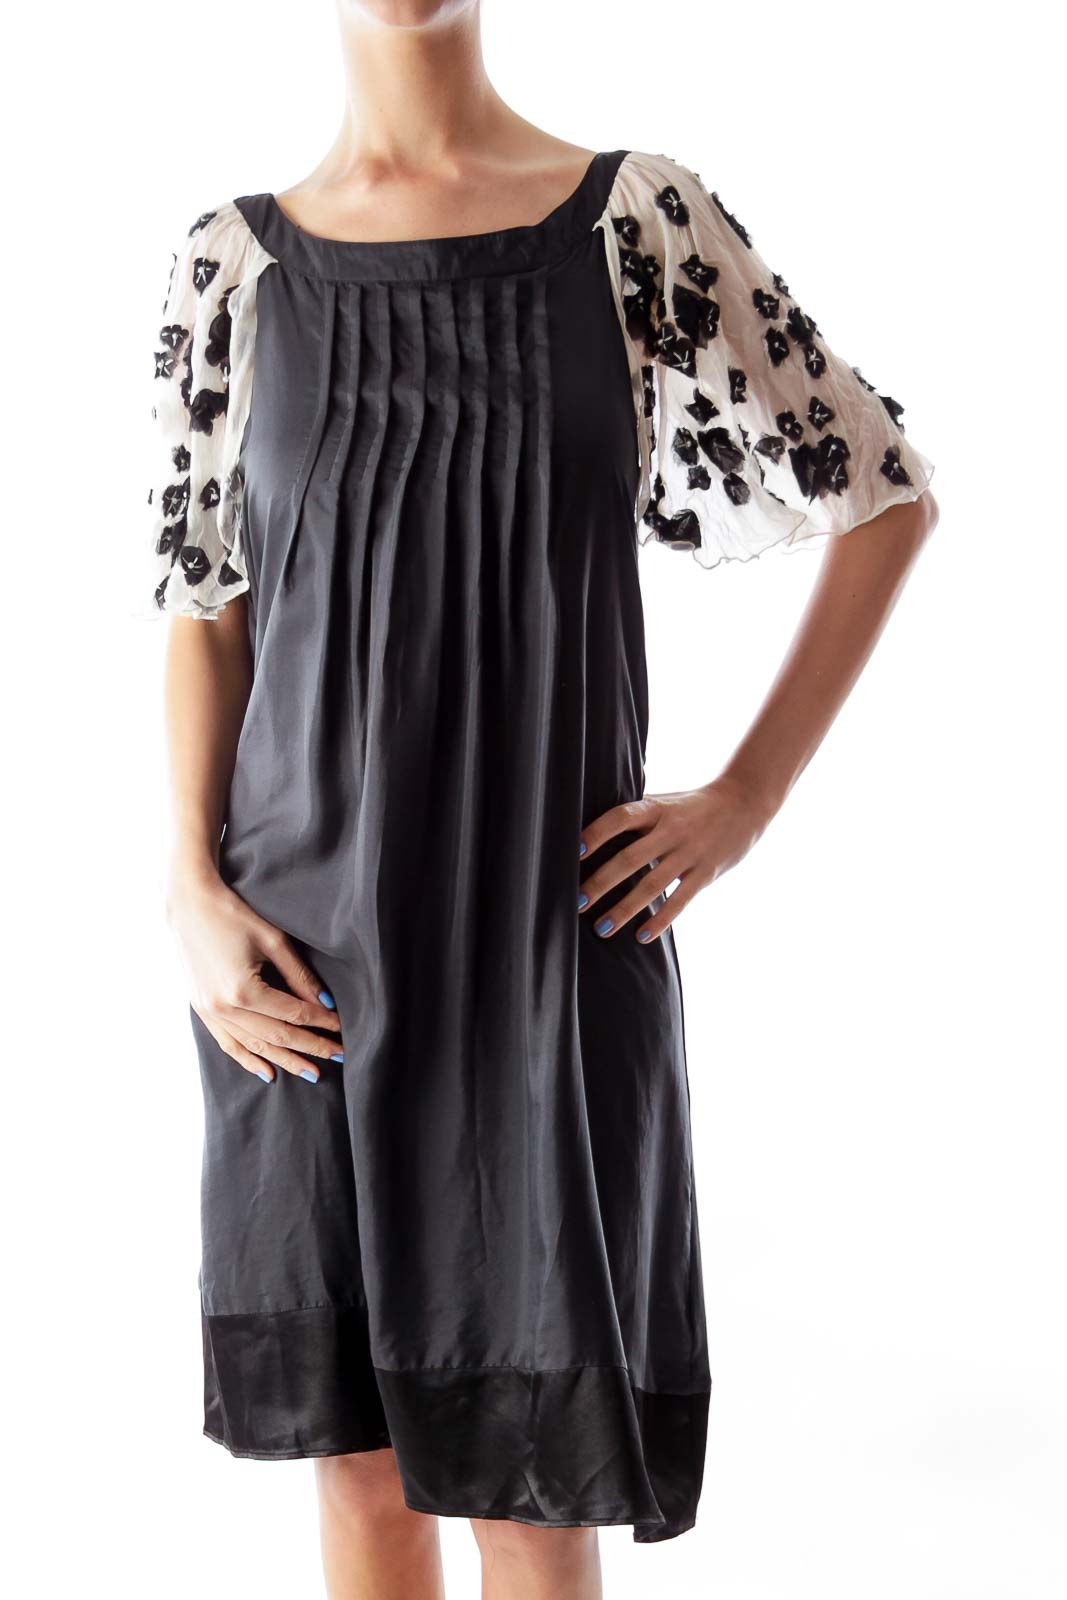 Black & Beige Cap Sleeve Dress